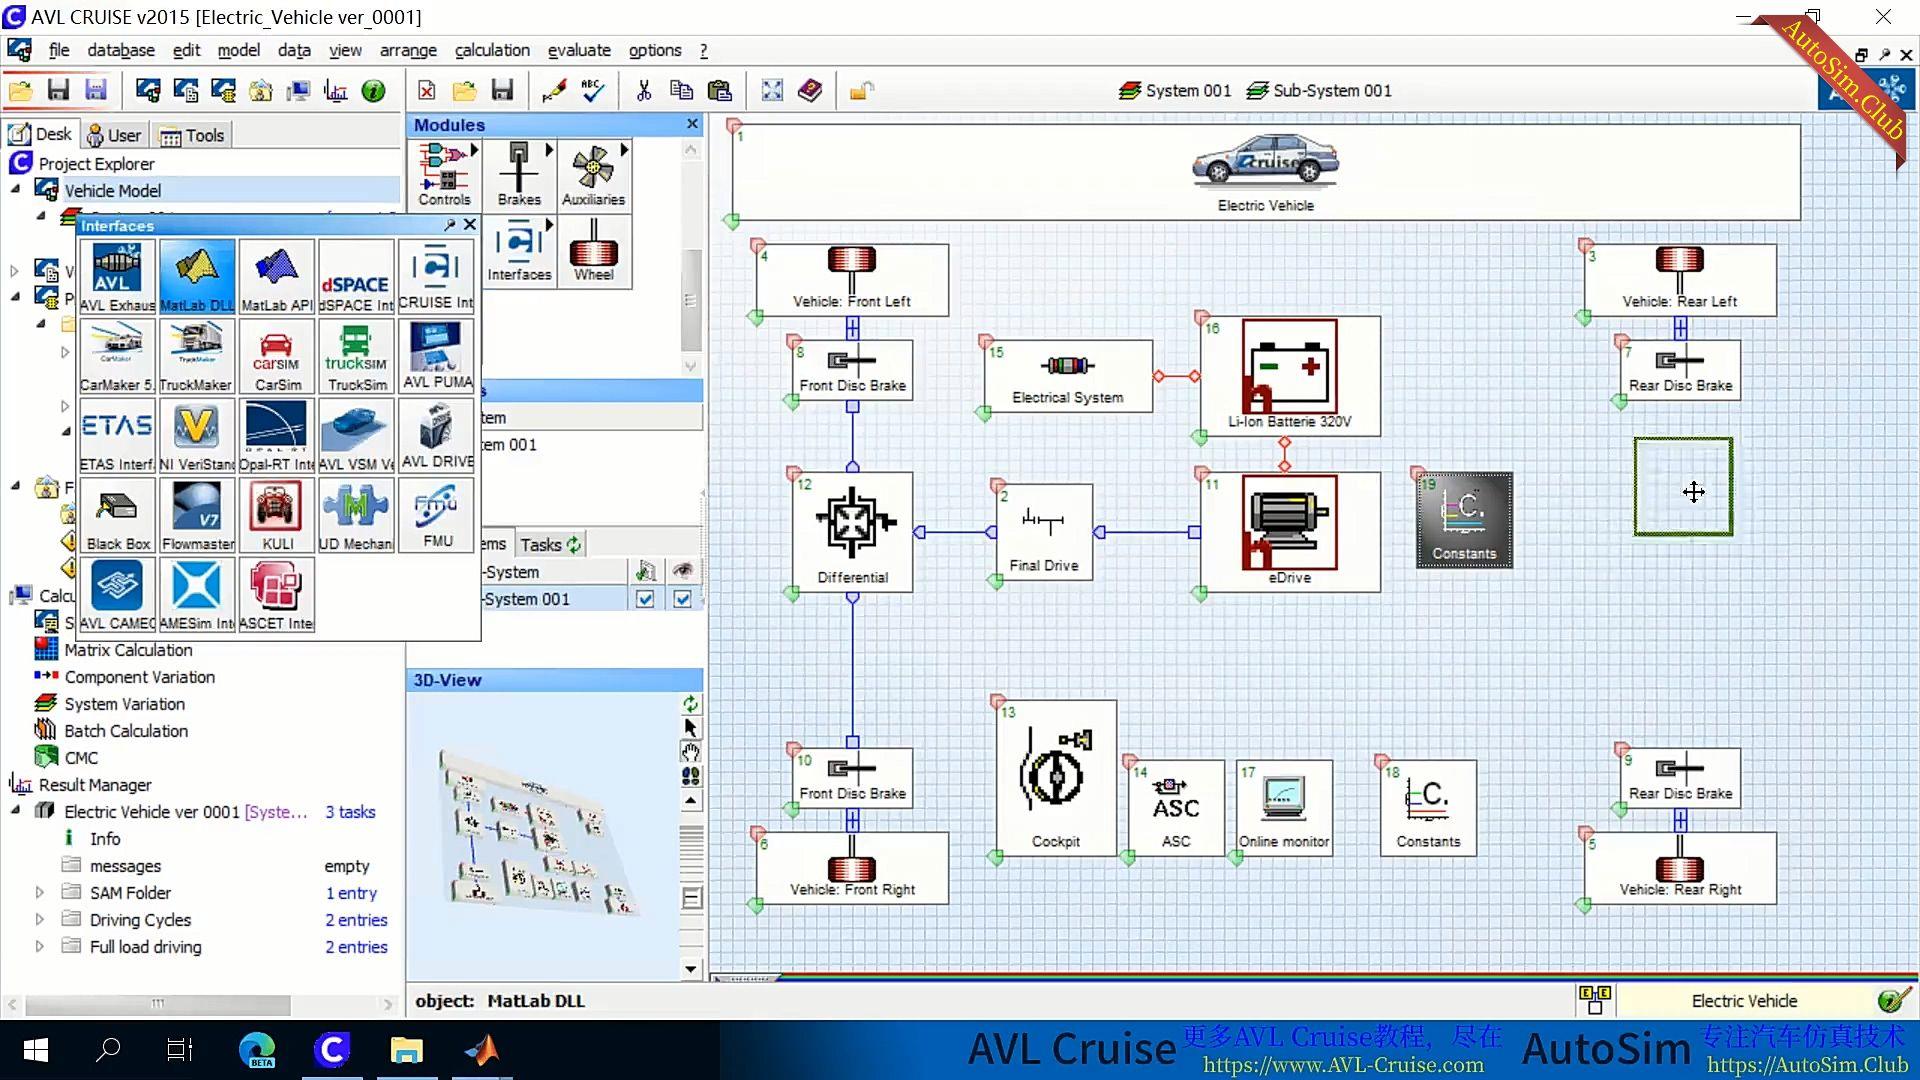 09.DLL接口联合仿真Cruise任务参数配置及车辆模型搭建演示.jpg